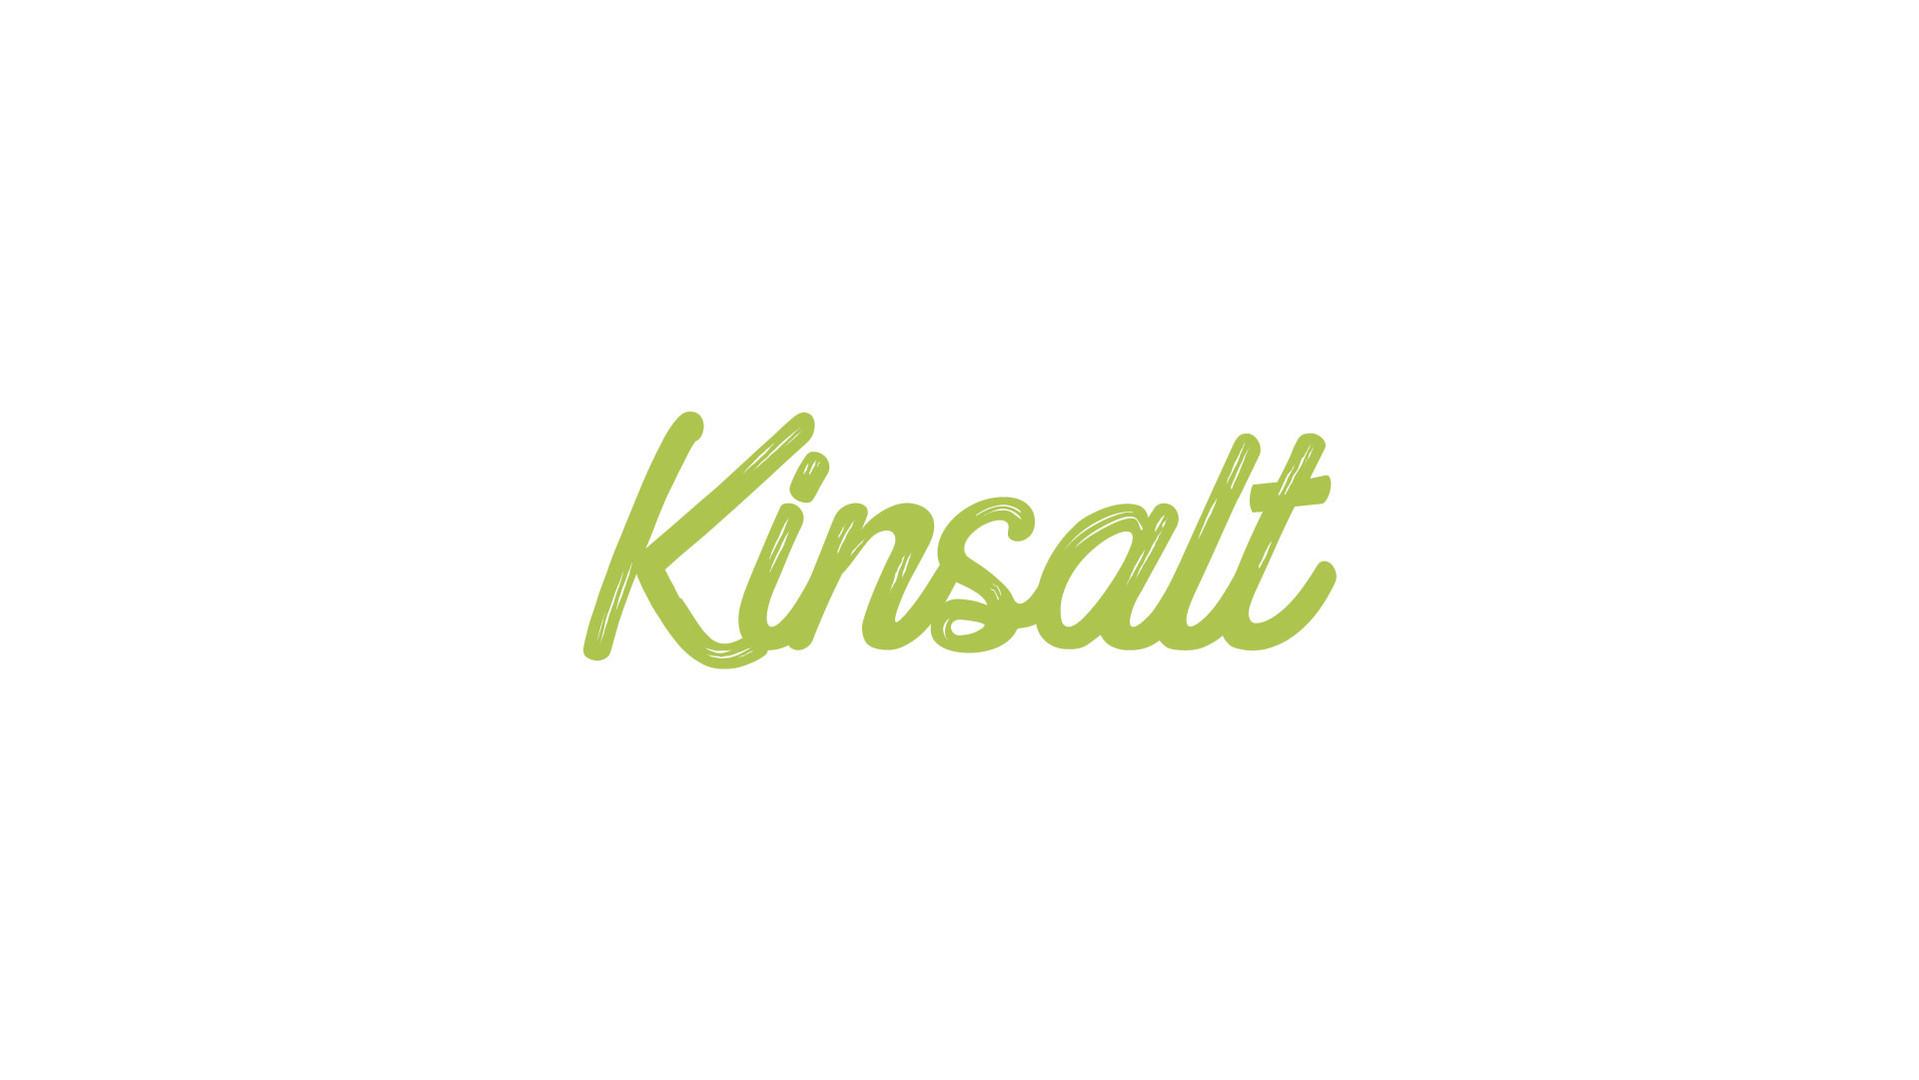 kinsalt_green_logo.jpg